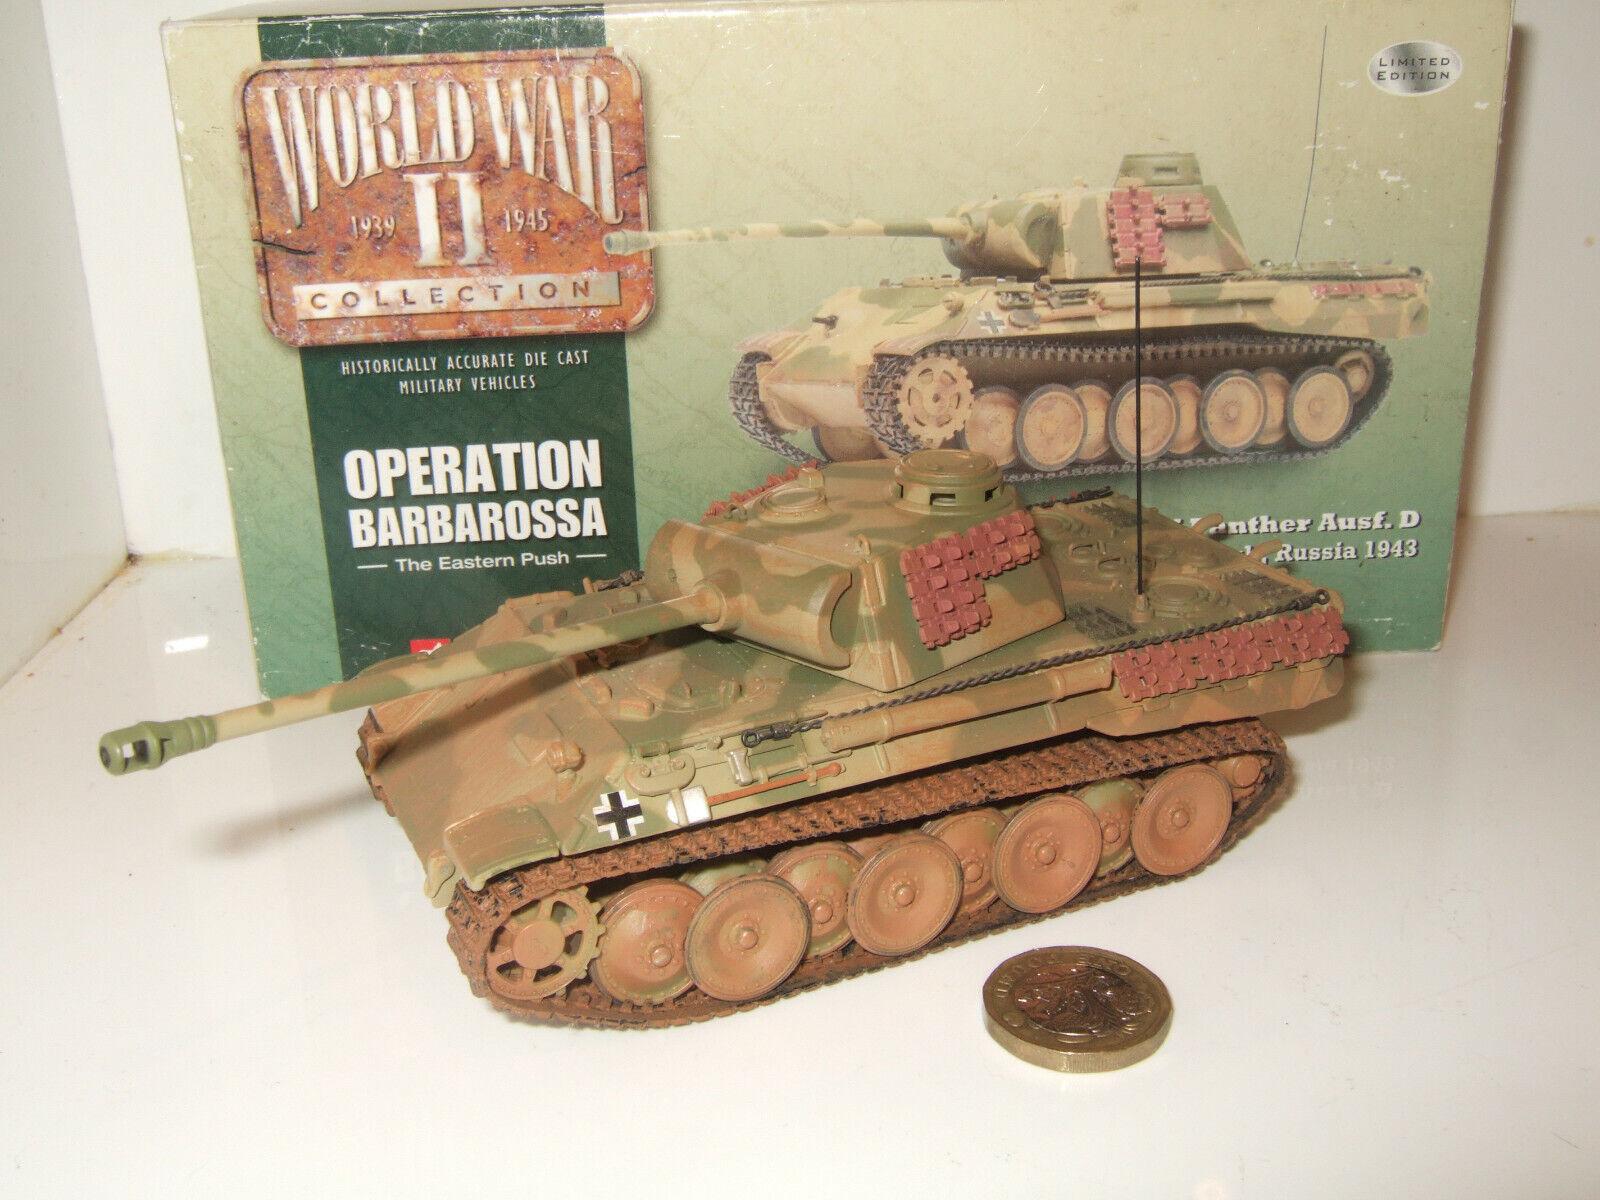 Corgi CC60201 PzKpfw V Panther Ausf. D Panzer Regt, op Barbarossa Rusia en 1 50